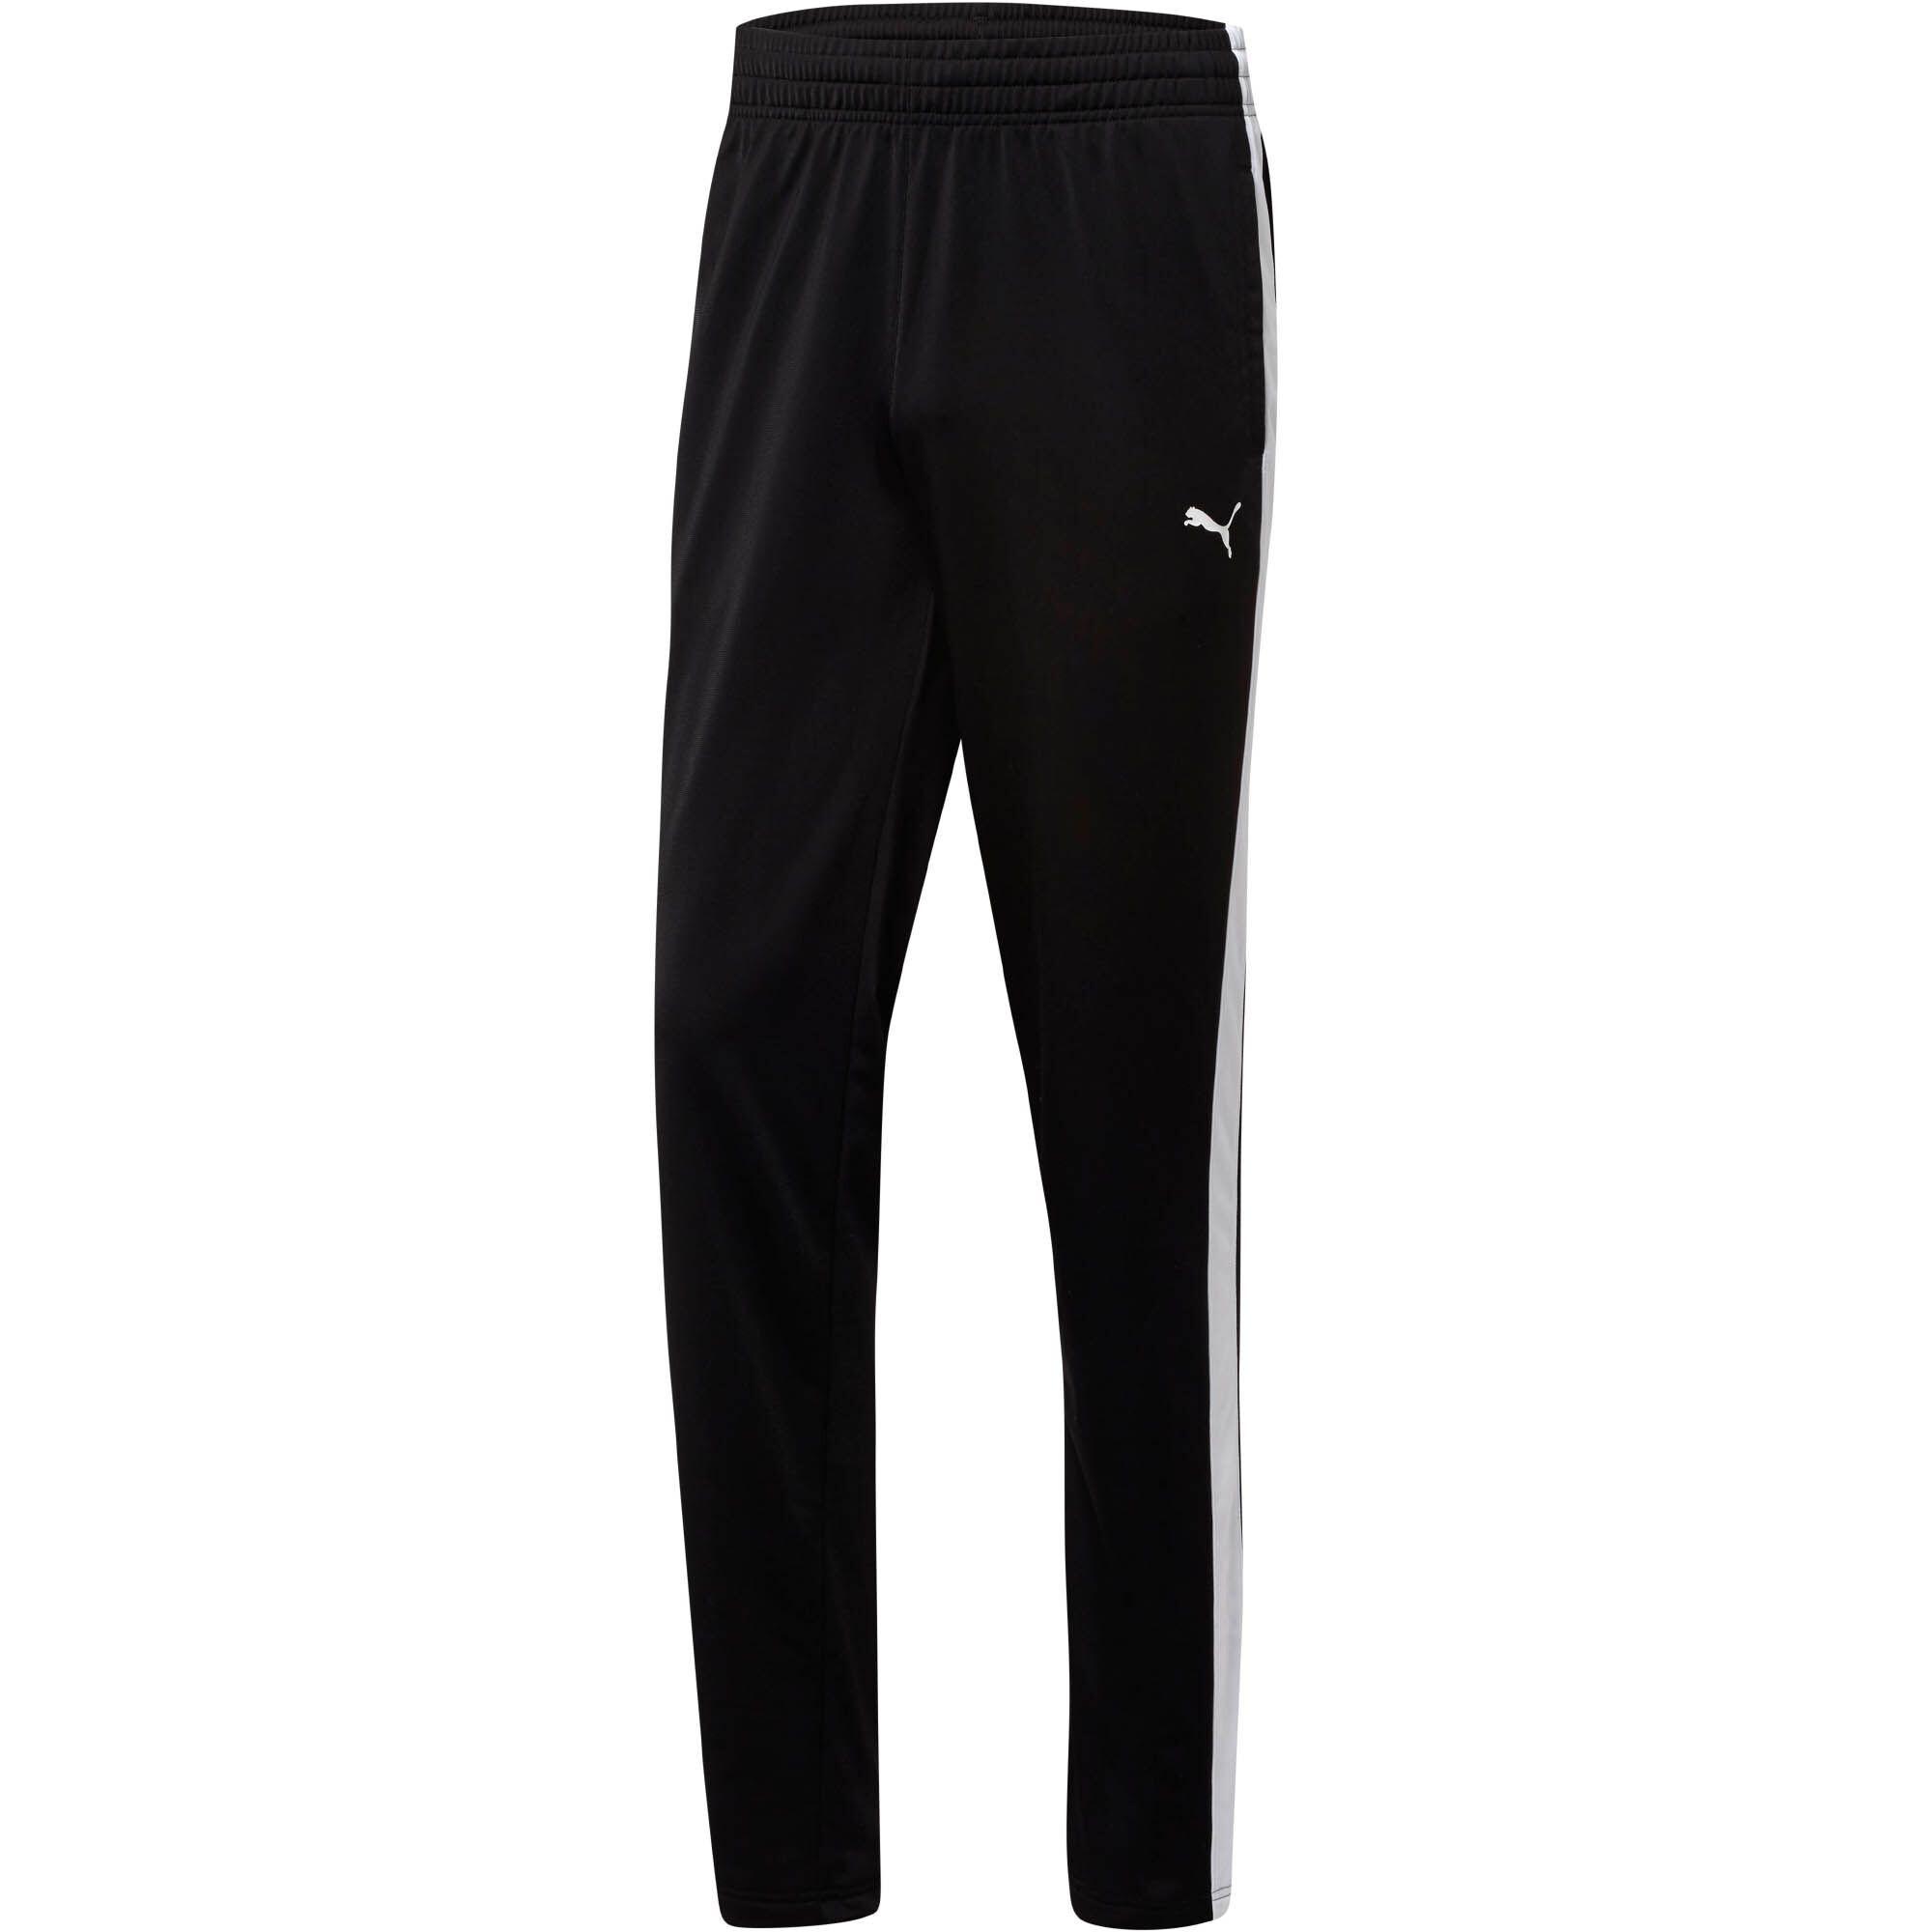 PUMA-Contrast-Open-Pants-Men-Knitted-Pants-Basics thumbnail 3